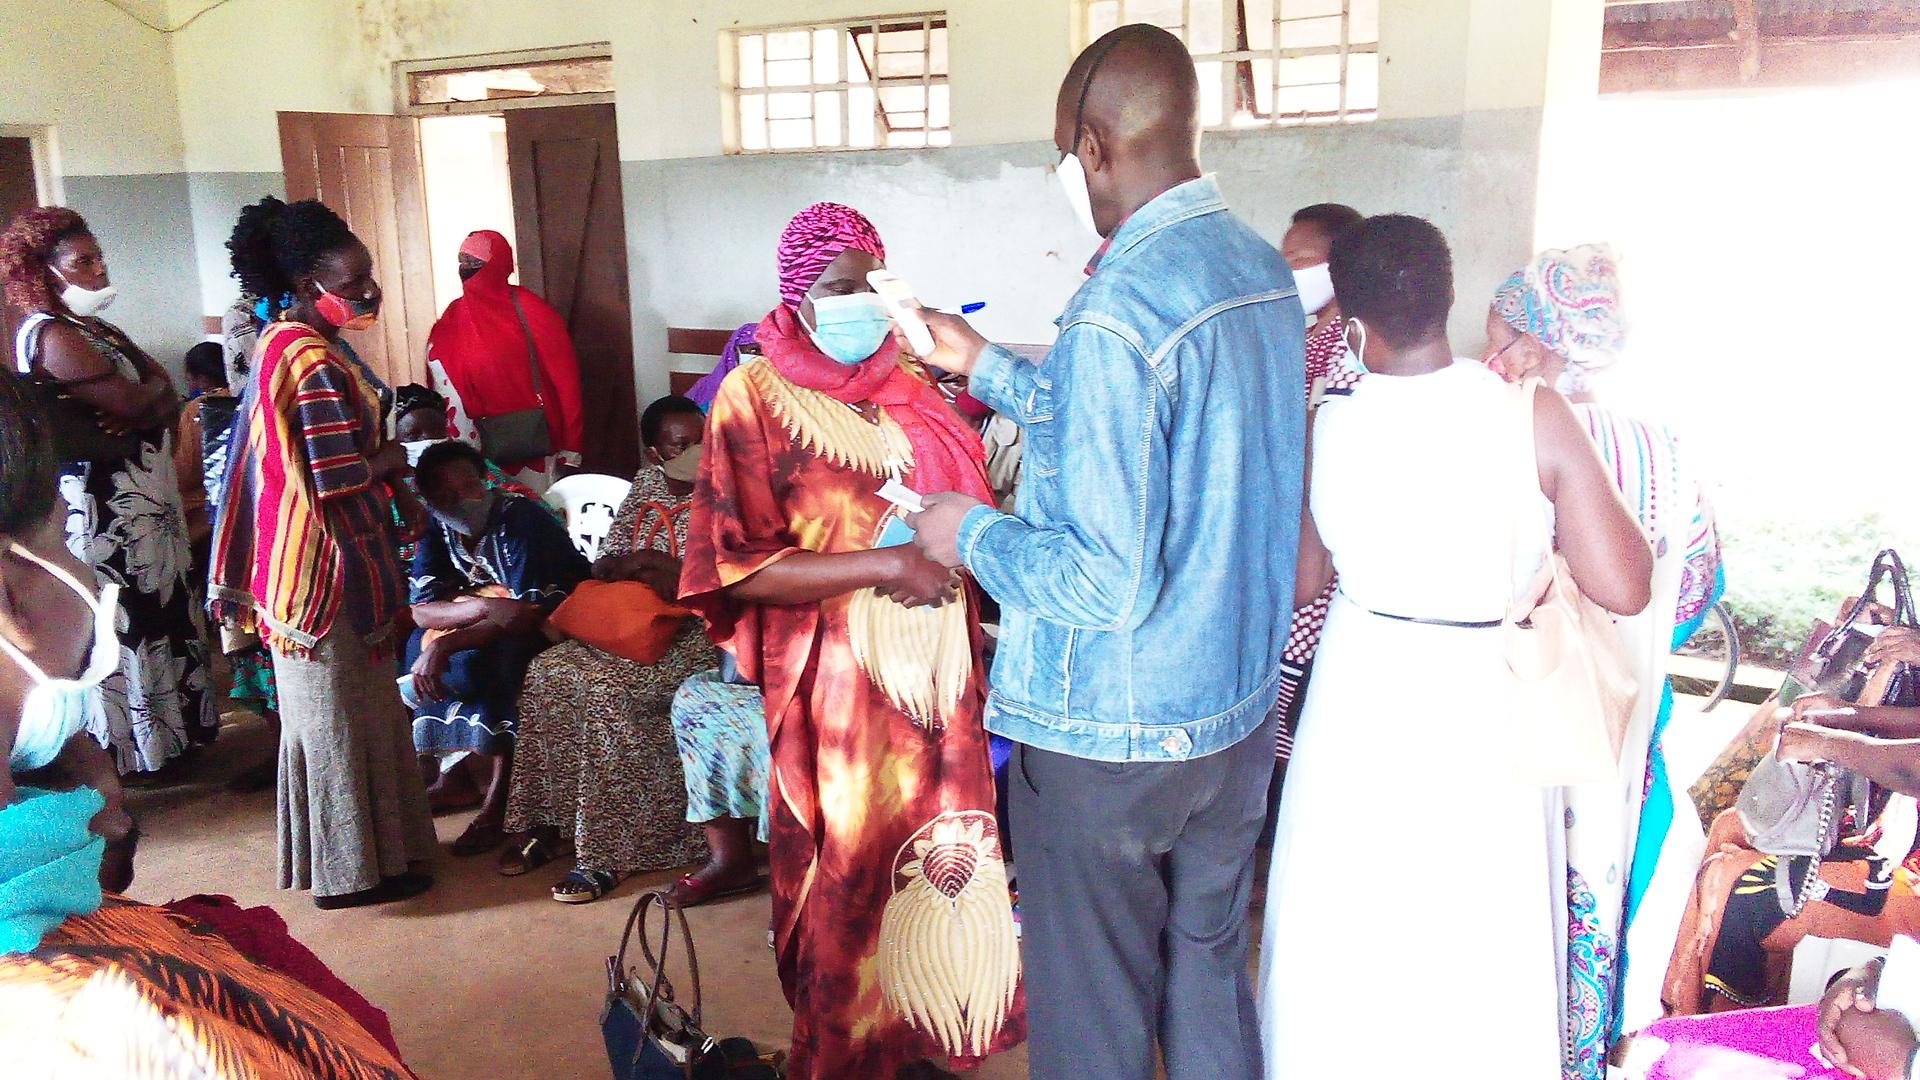 ASCVD Risk Study patient recruitment At Entebbe Grade A Hospital